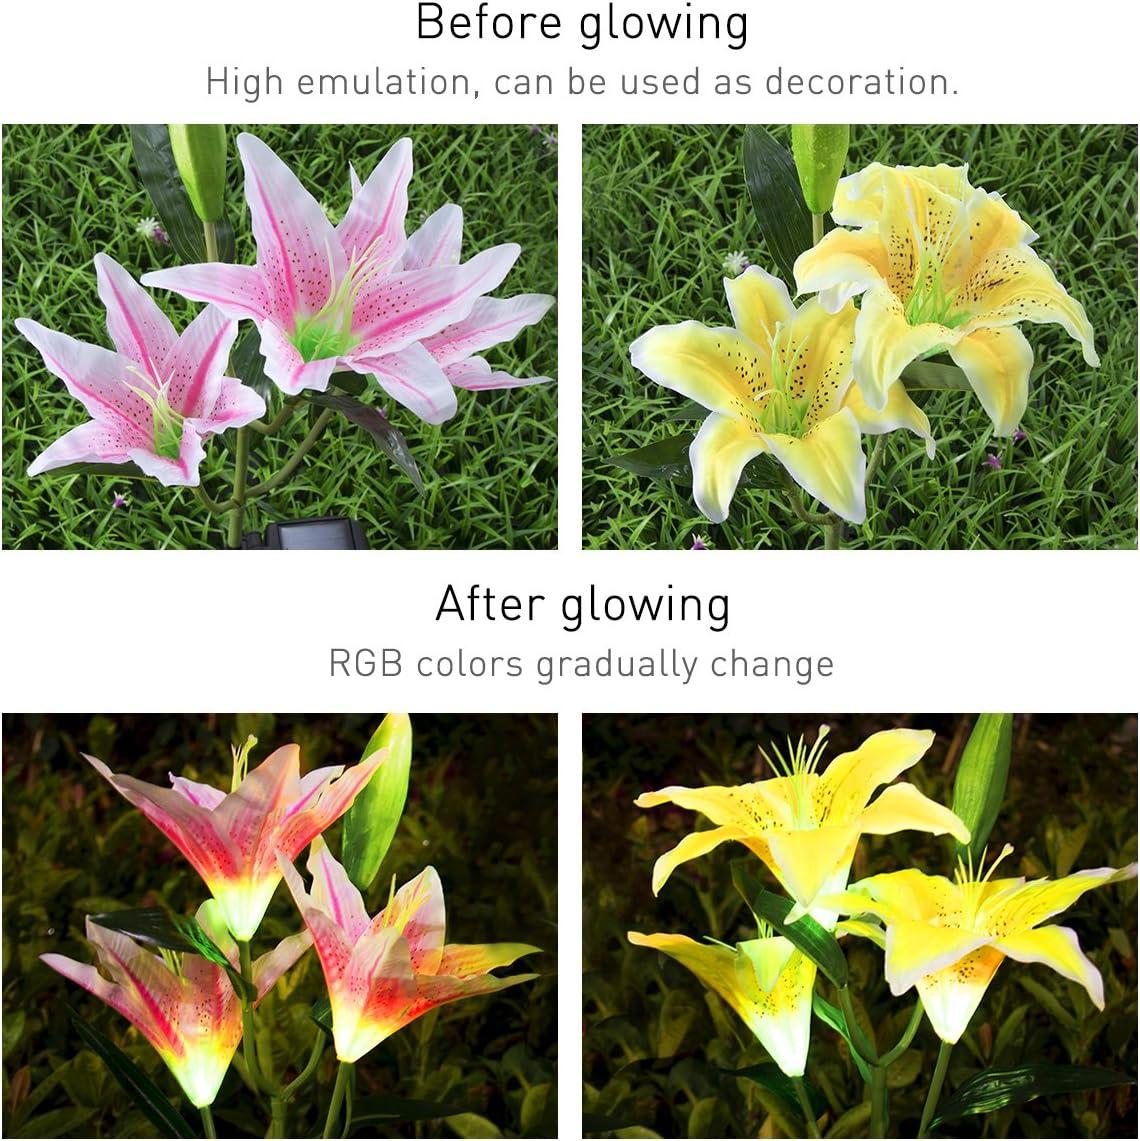 Solar Garden Lights, Solar Garden Light Lily Flower Decorative Lights Solar String Lights Decor 2Pcs for Yard Lawn